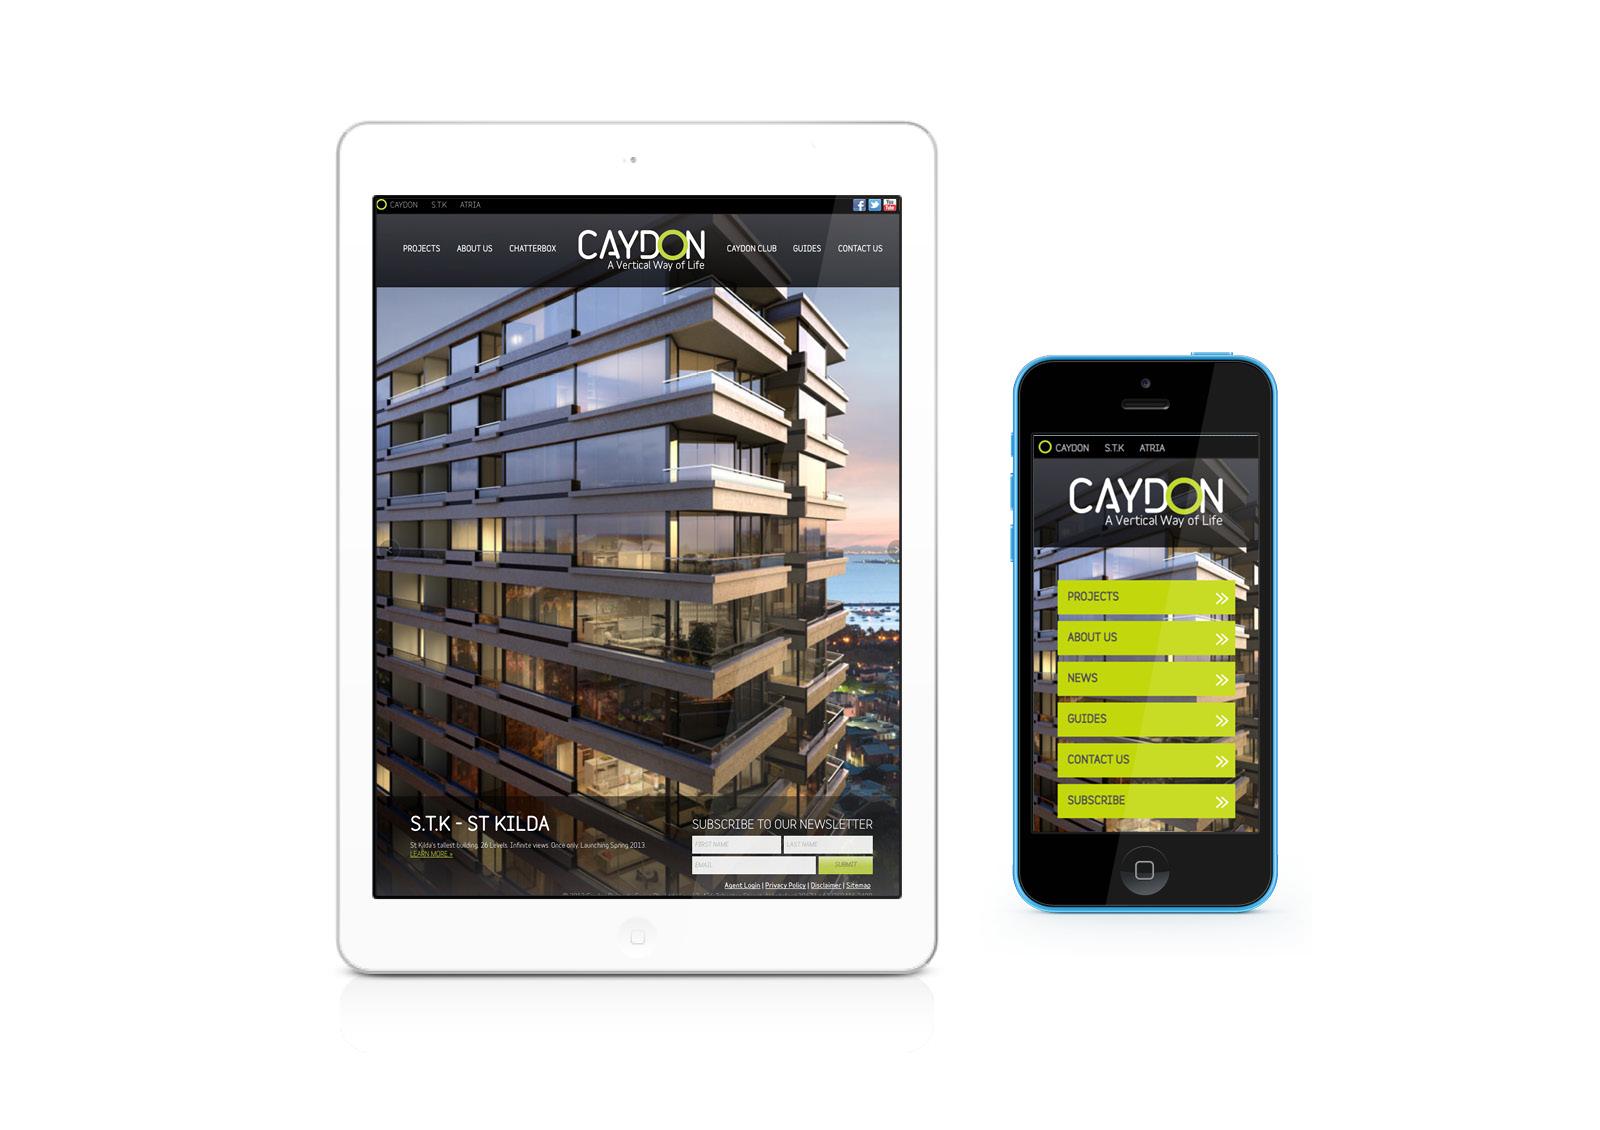 Caydon mobile site - home